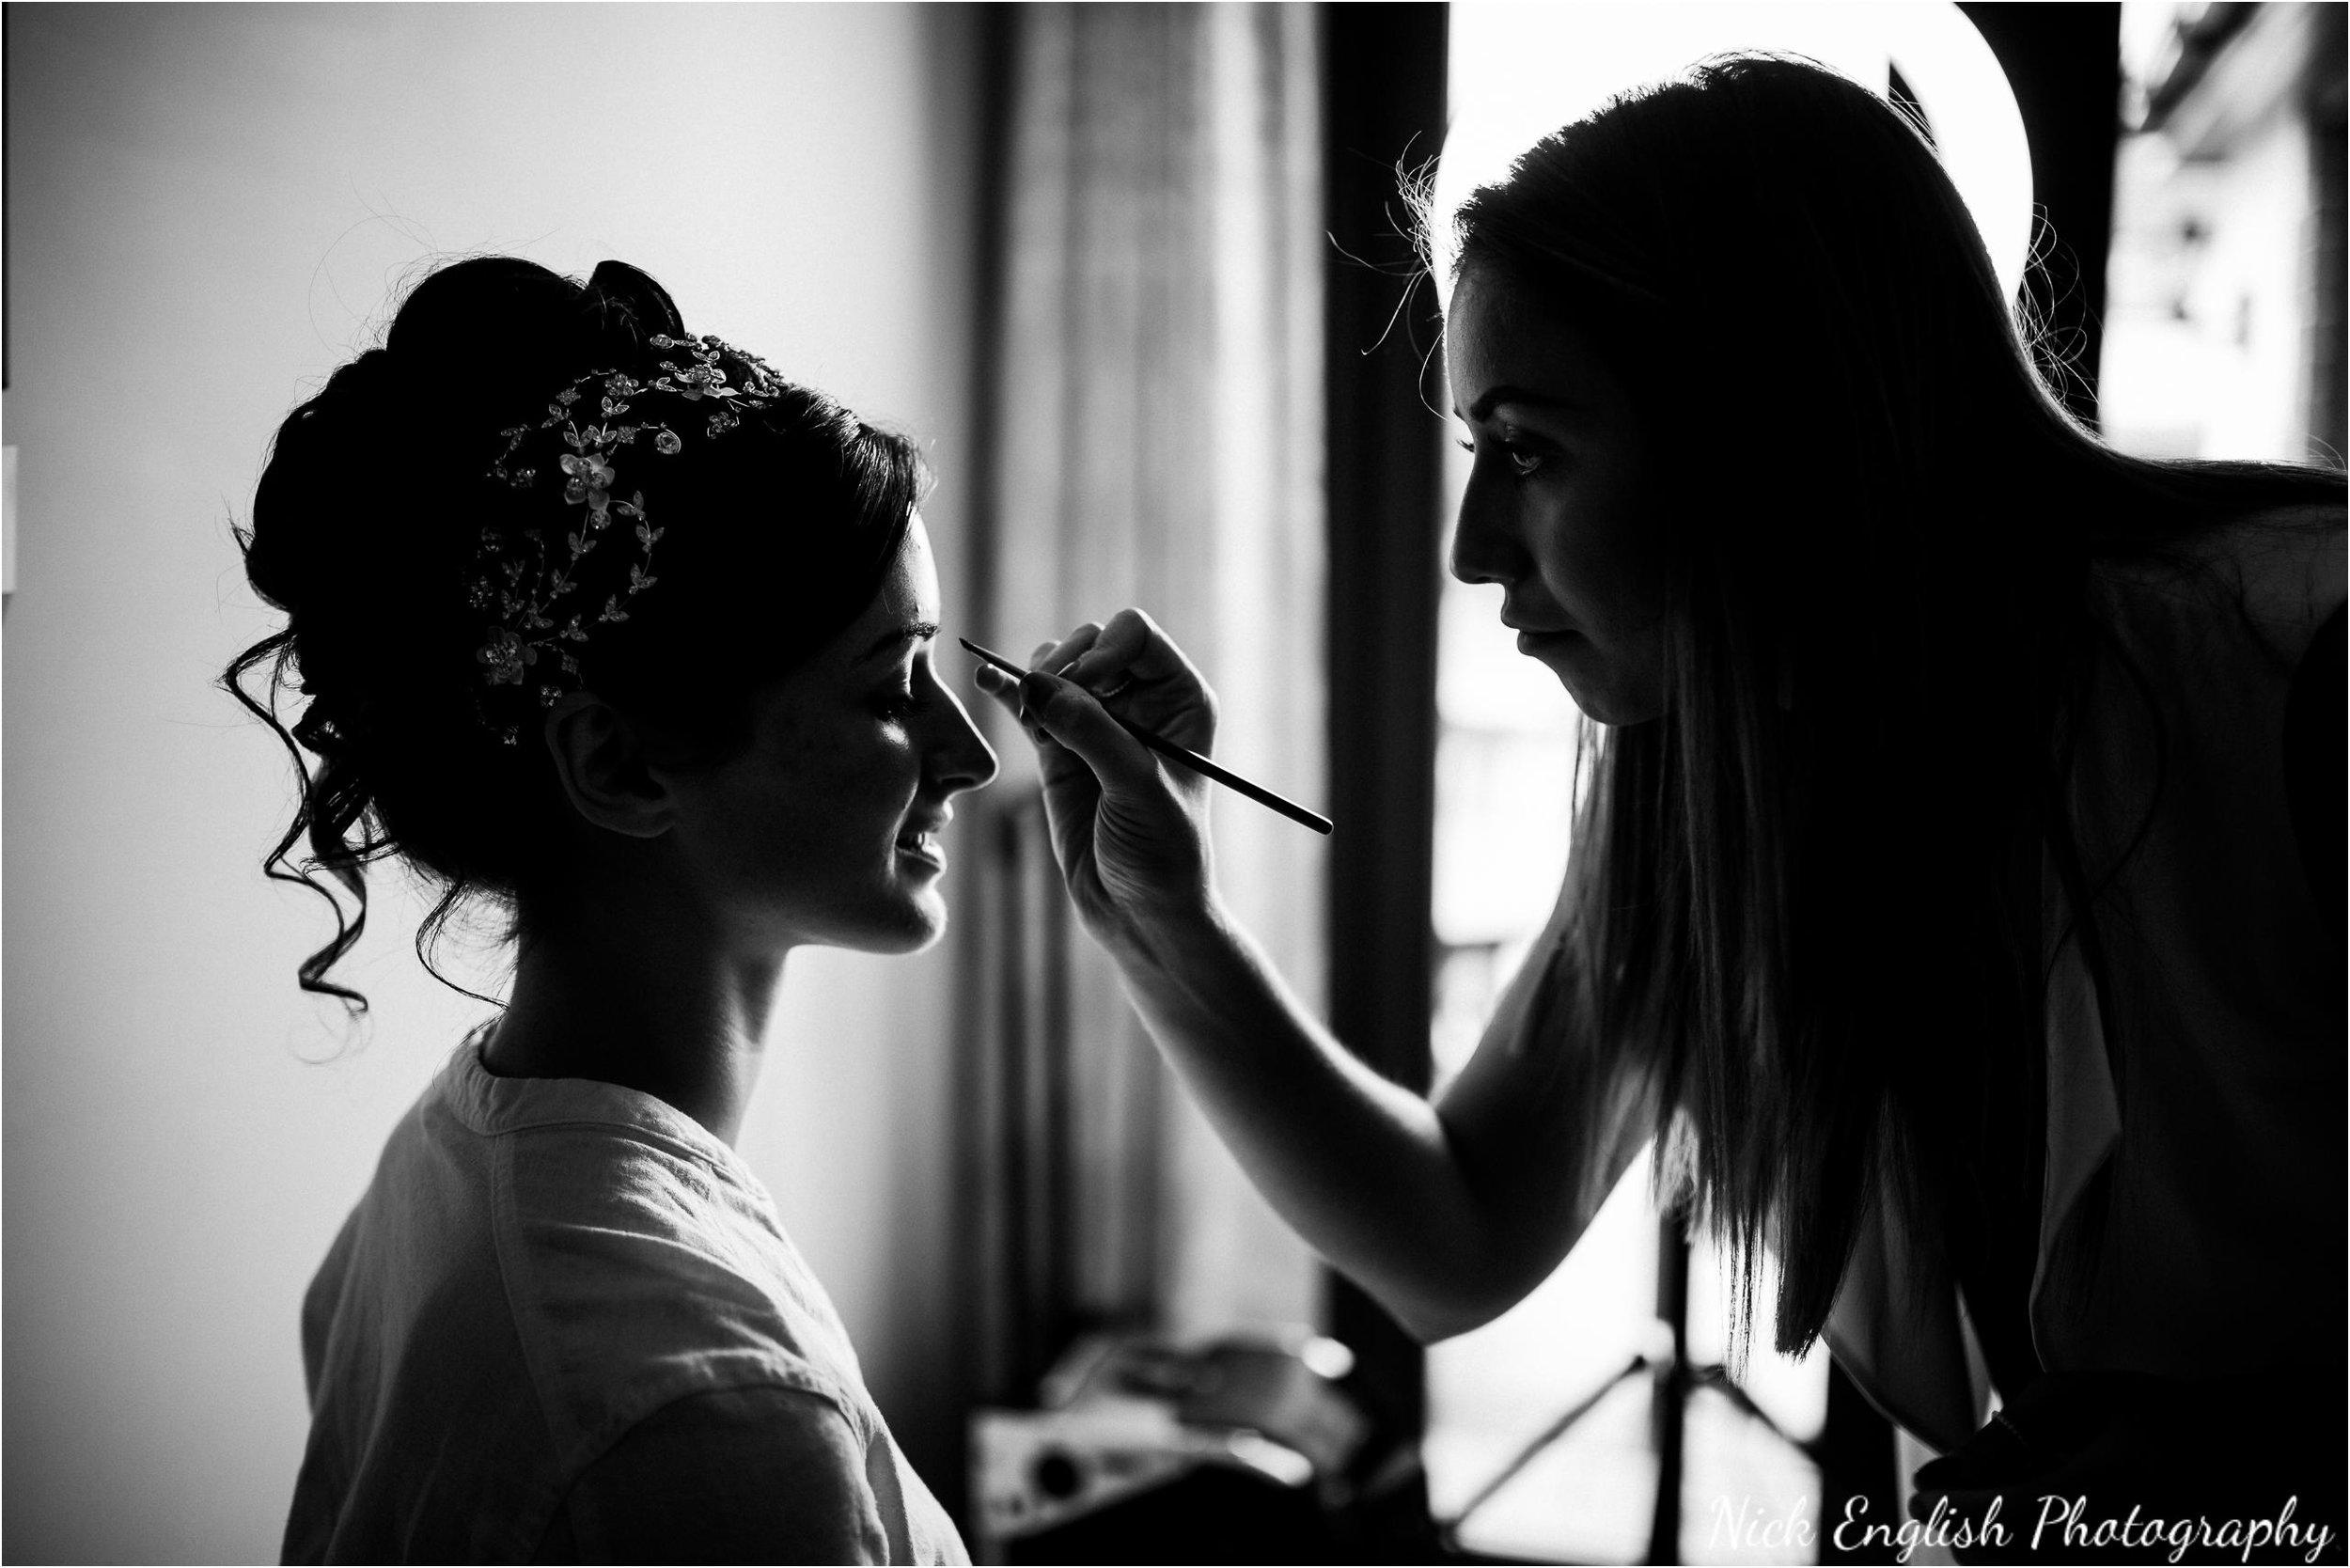 Emily David Wedding Photographs at Barton Grange Preston by Nick English Photography 13jpg.jpeg